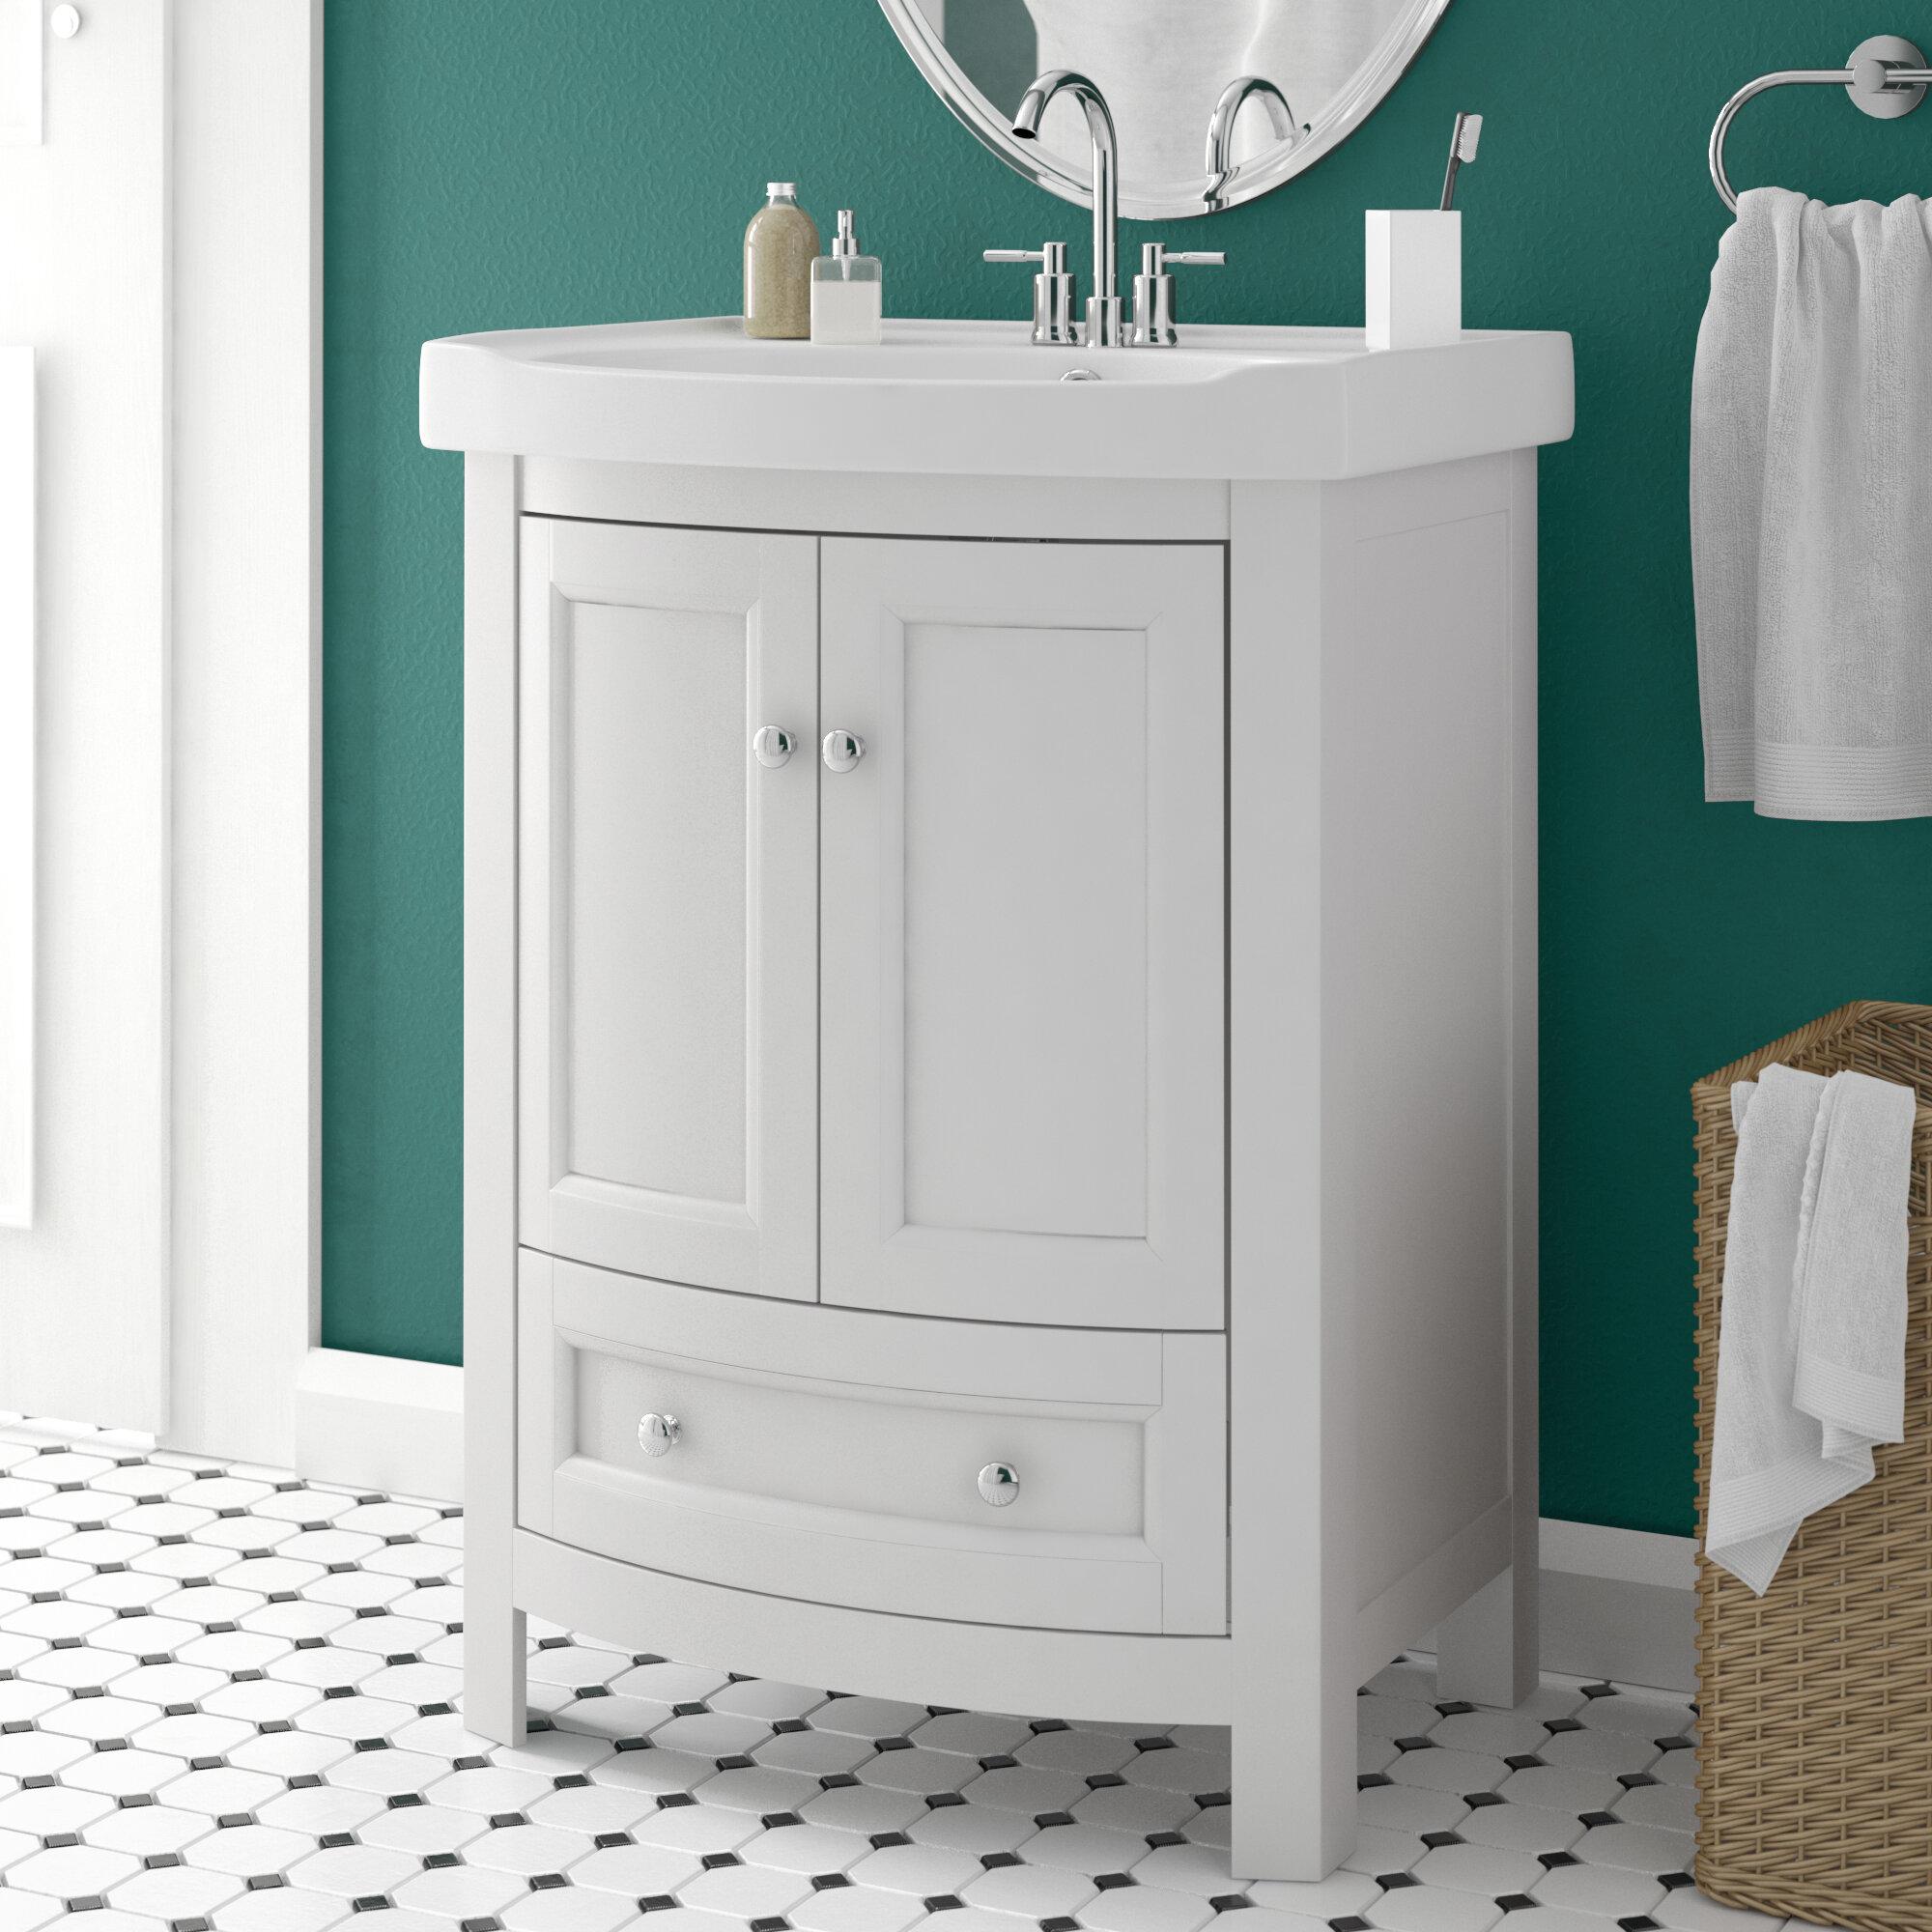 Charlton Home Thibeault 24 Single Bathroom Vanity Set Reviews Wayfair